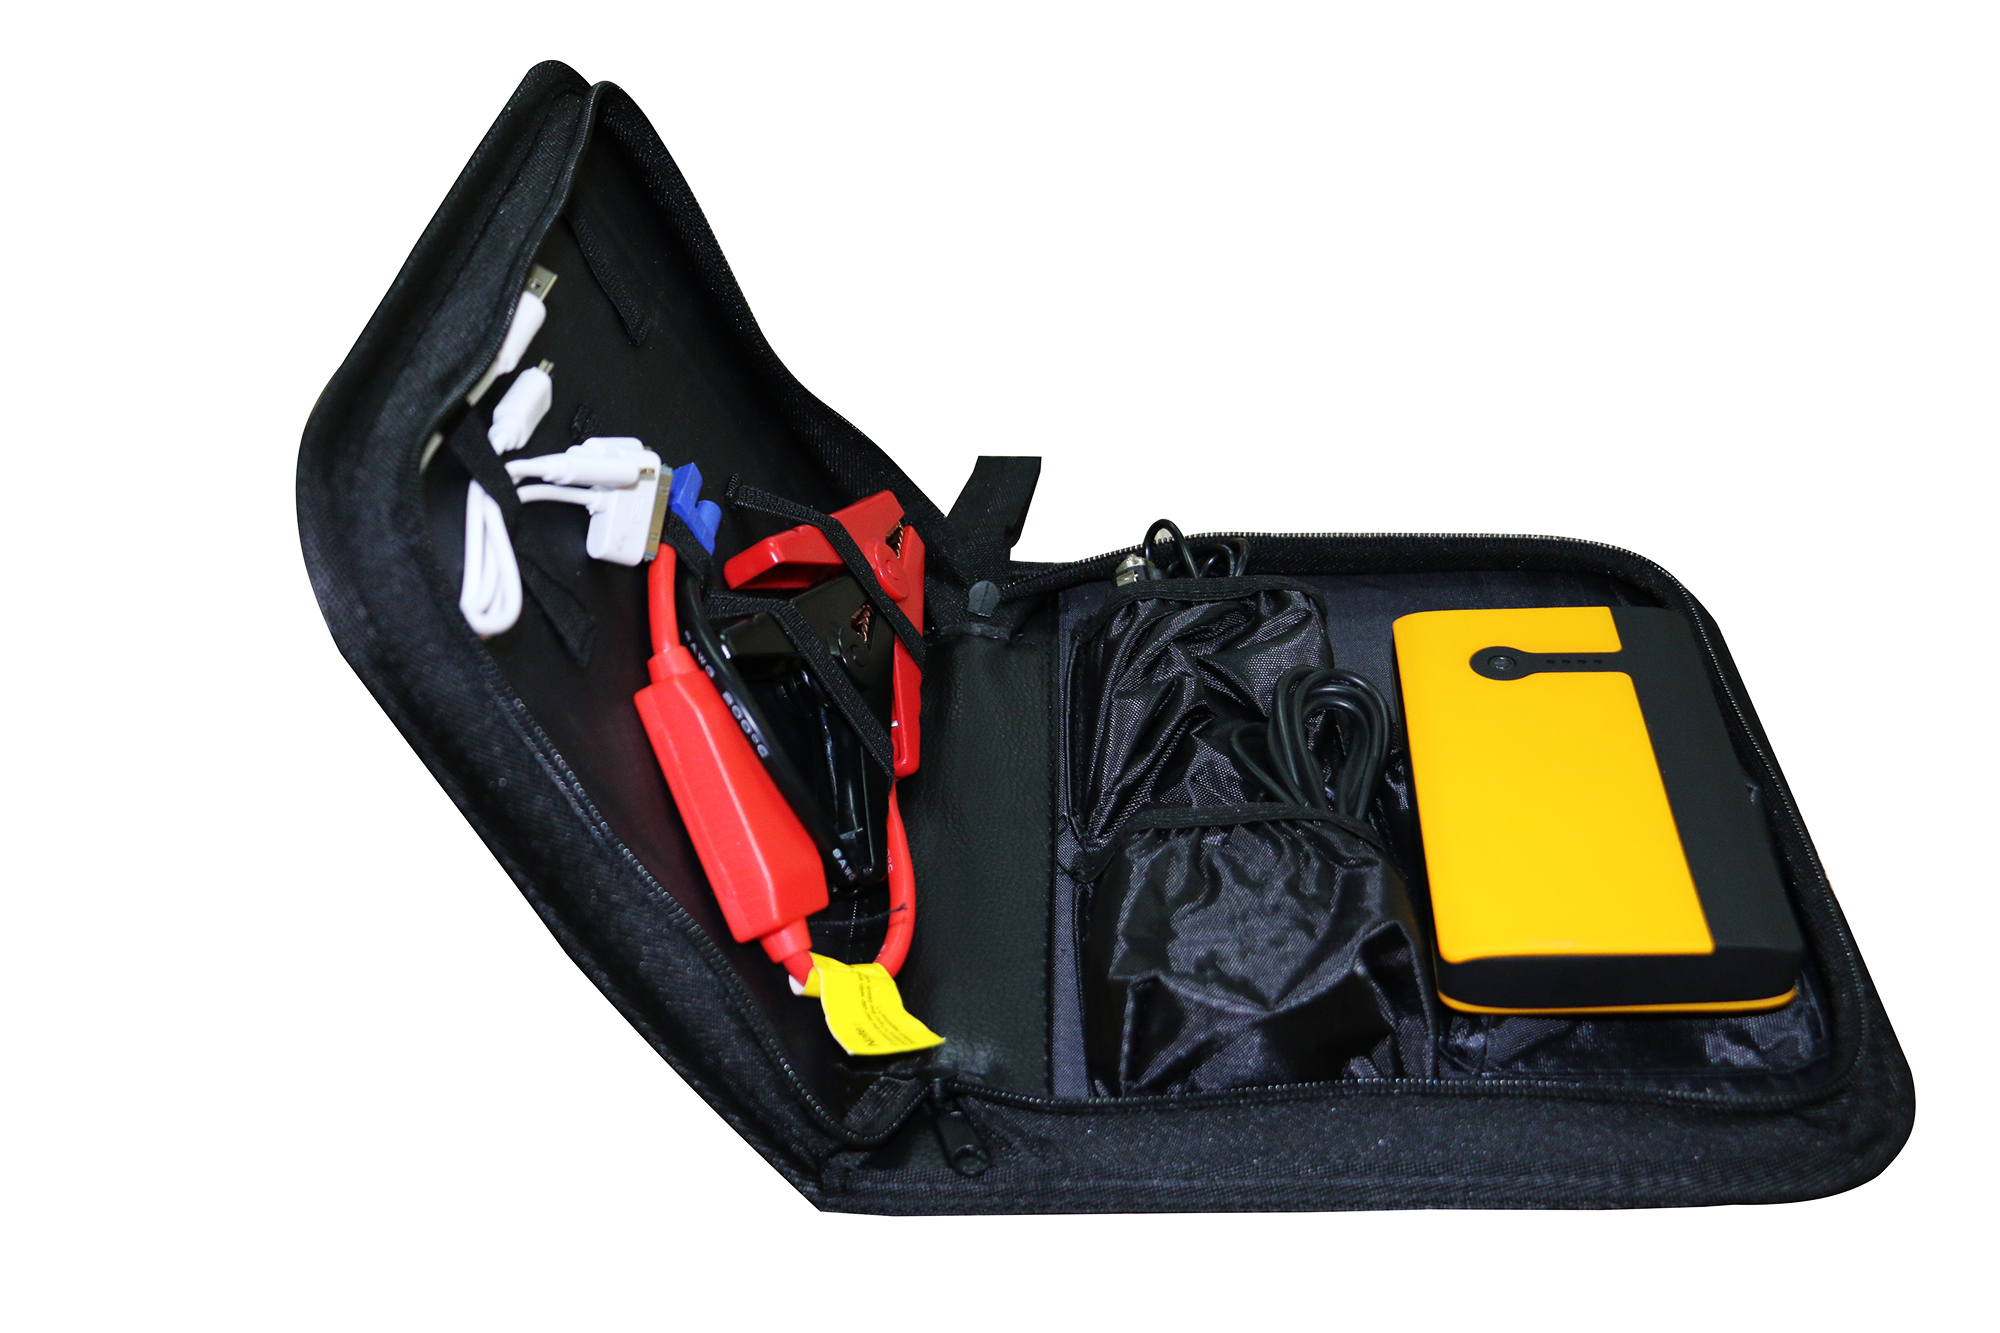 AGA Multi-function Easy Quick Jumper A21 Portable Jump Starter 12v 8000mAh